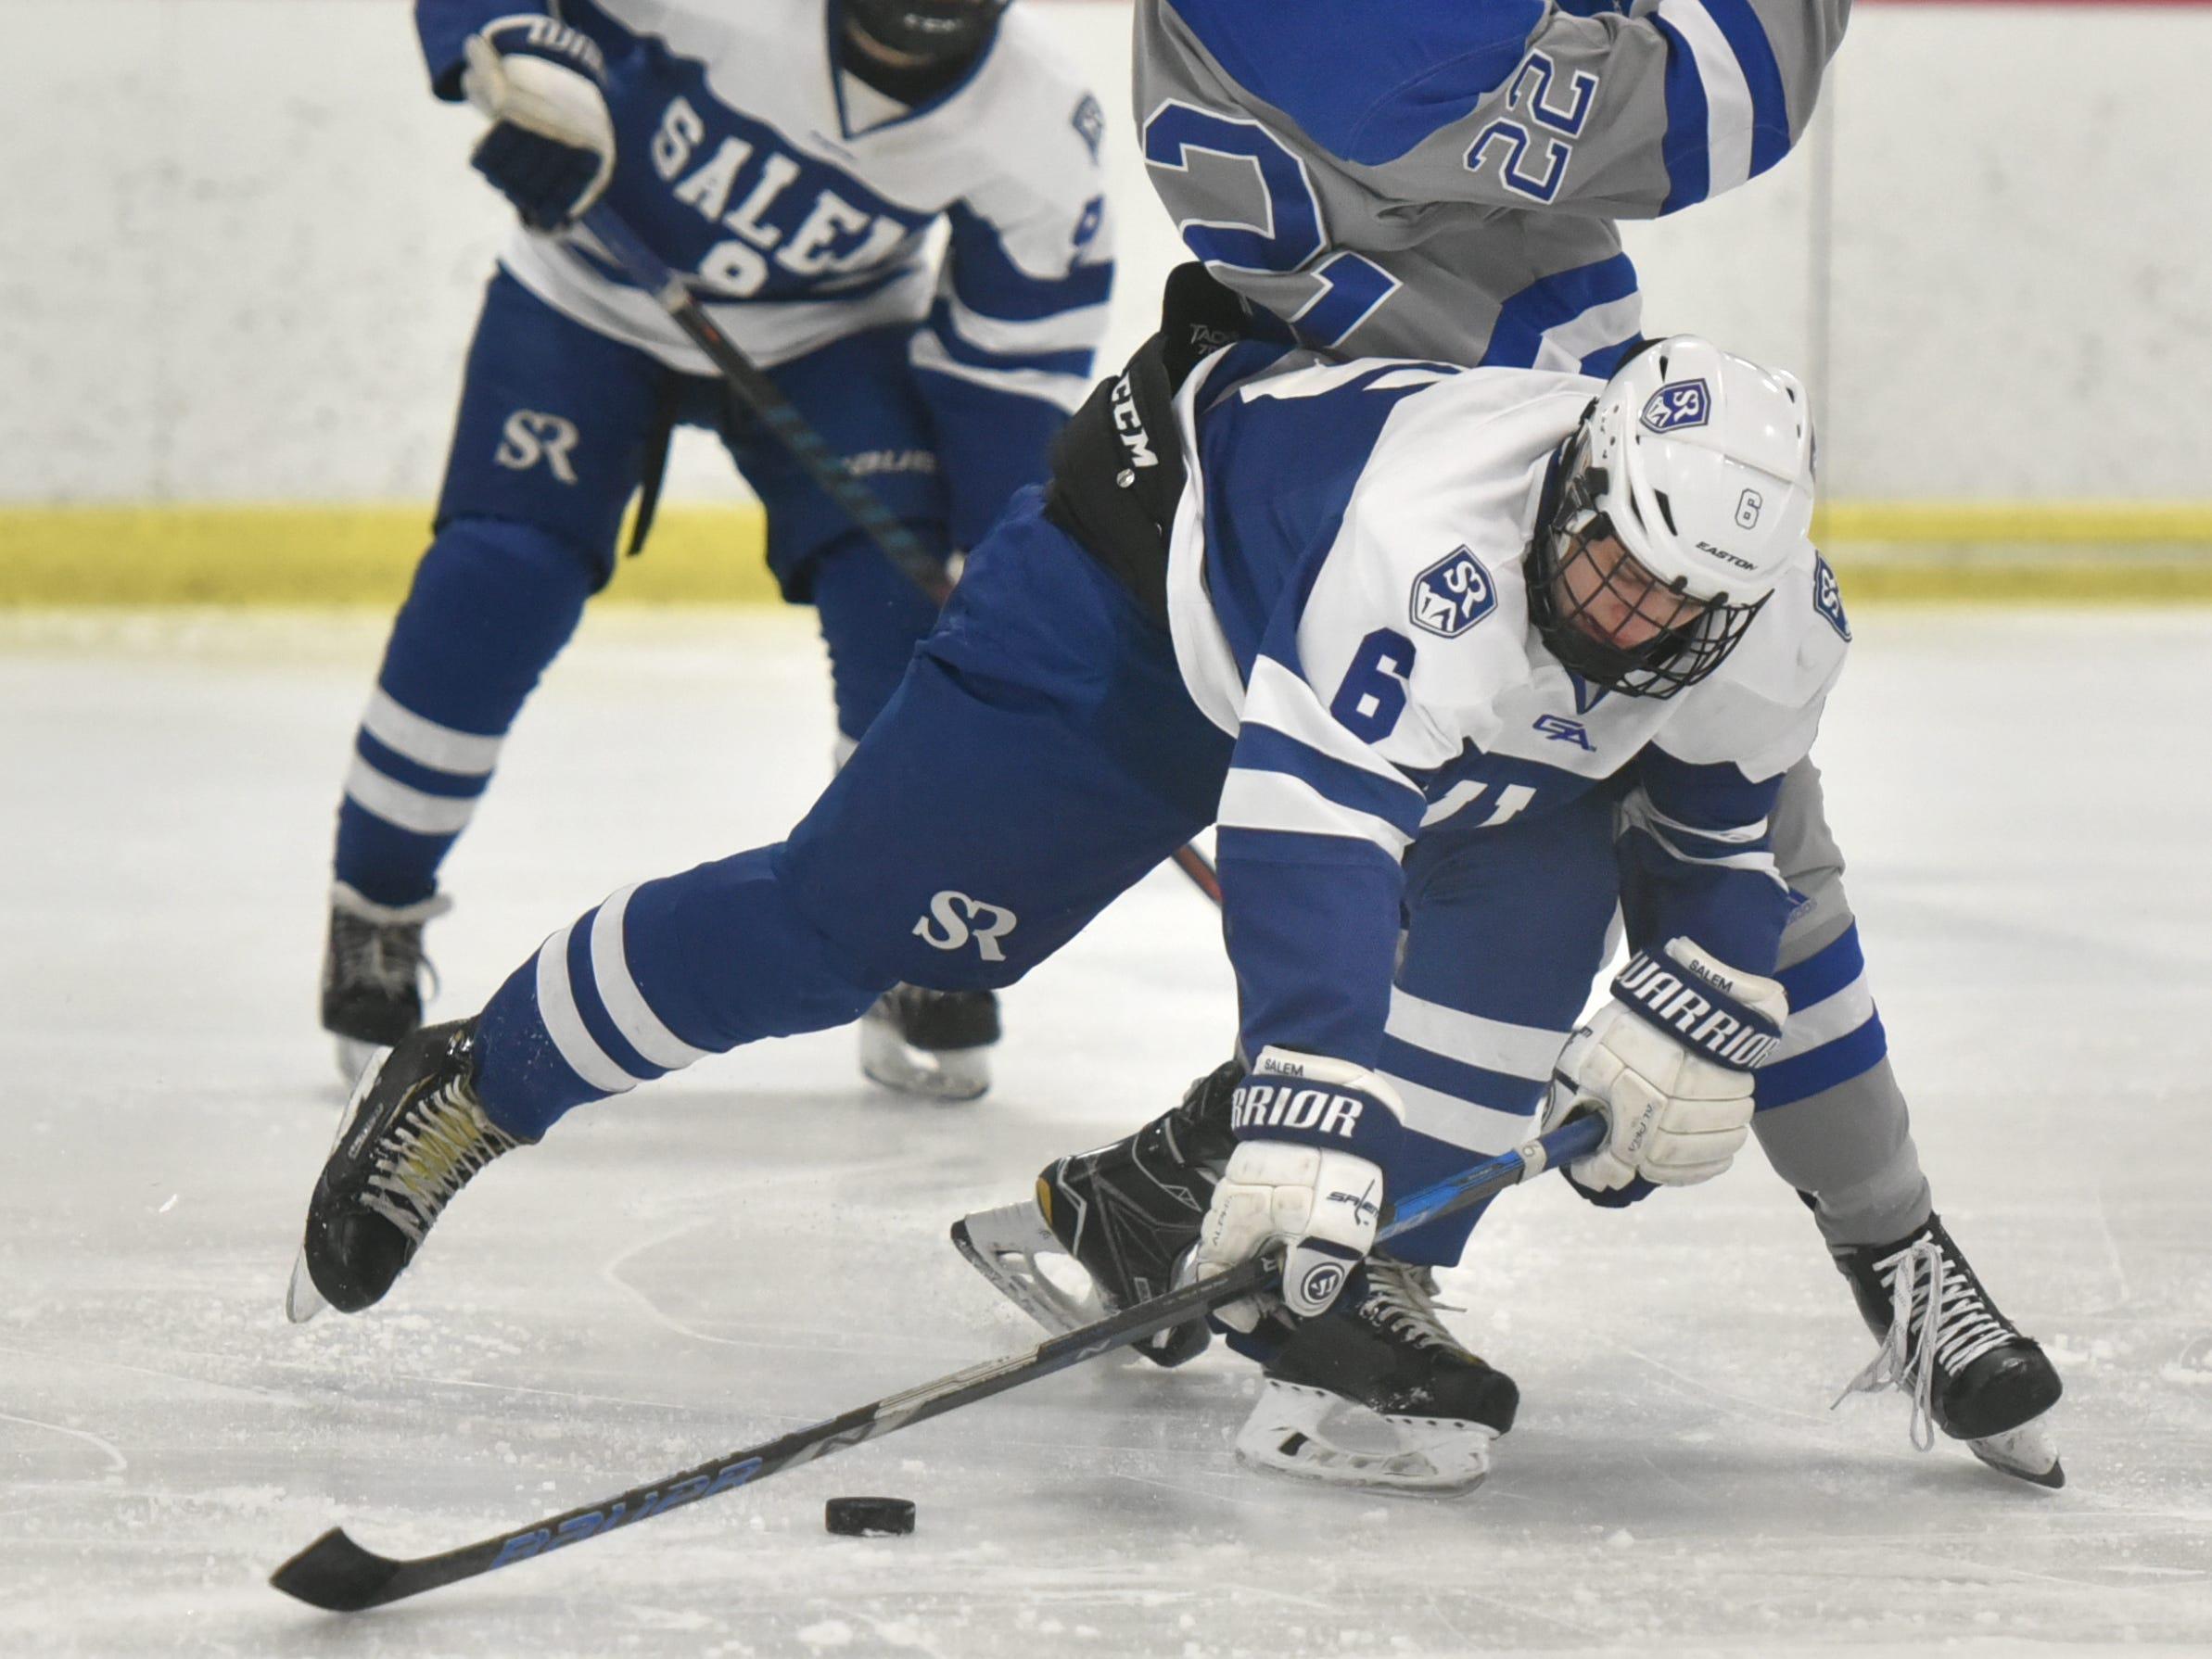 Salem Rock Kurt Jensen, (6) and CC's Ryan Pearson collide at center ice.